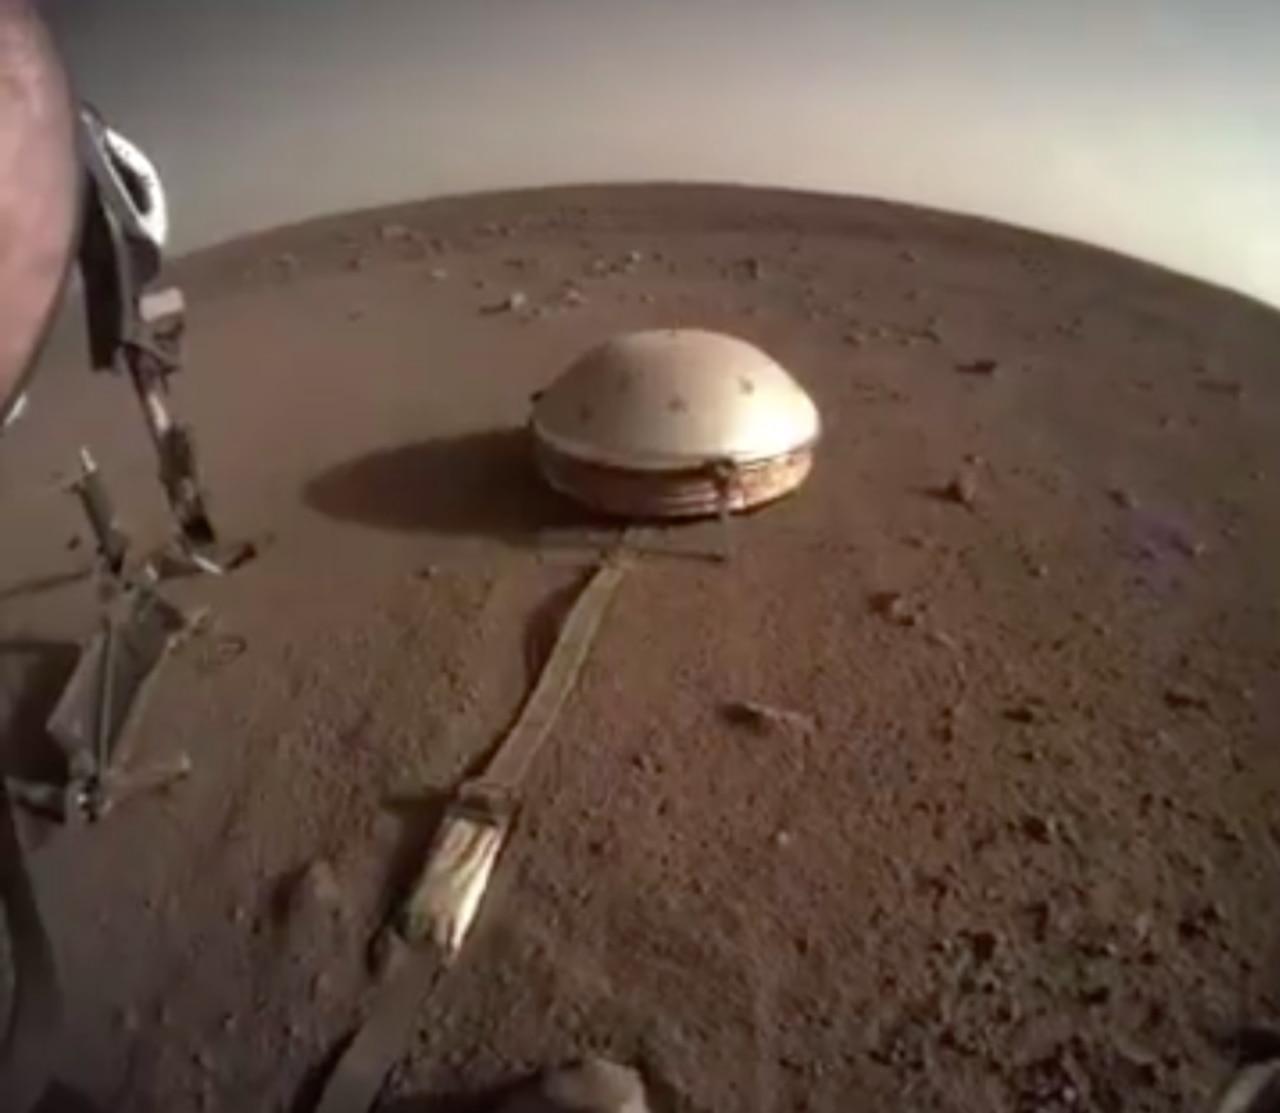 The lander's on-board camera shows the Mars landscape